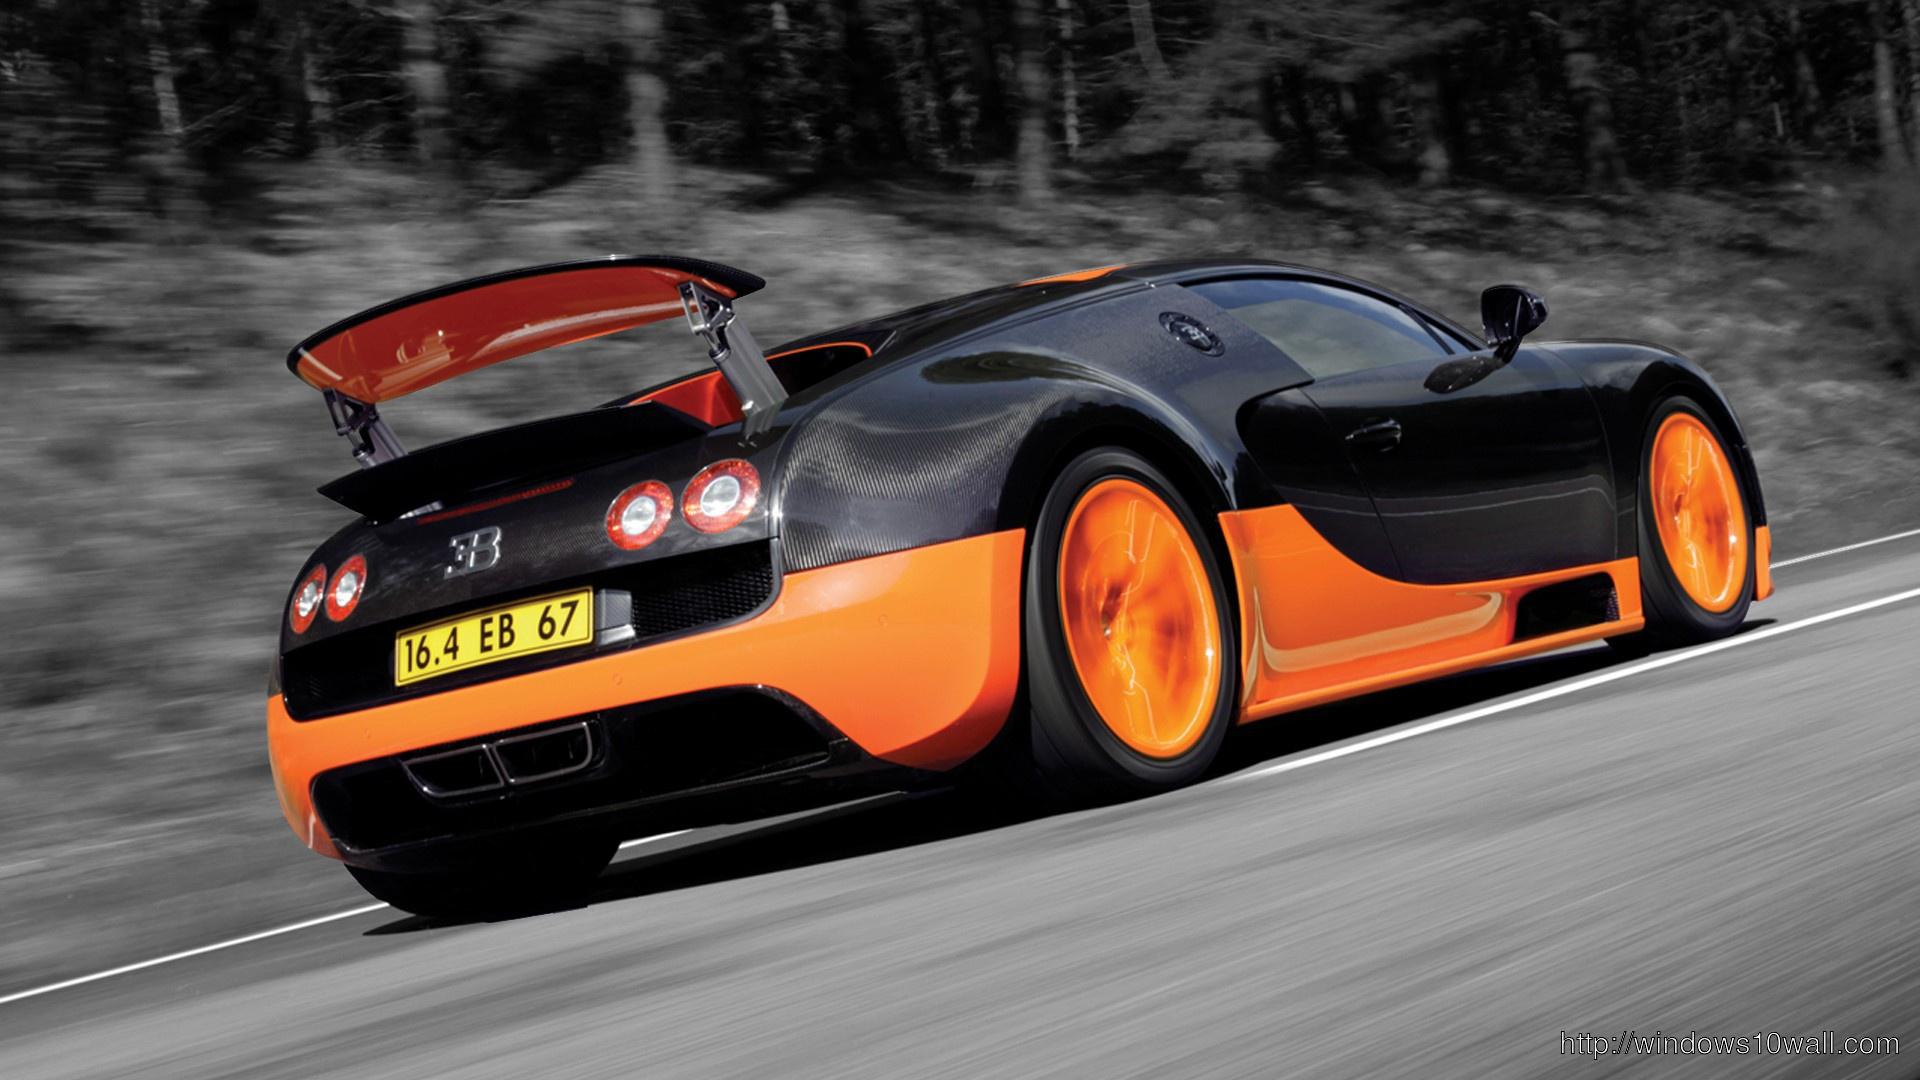 bugatti sports cars free wallpaper bugatti veyron super sport side - Bugatti Veyron Super Sport Top Gear Wallpaper